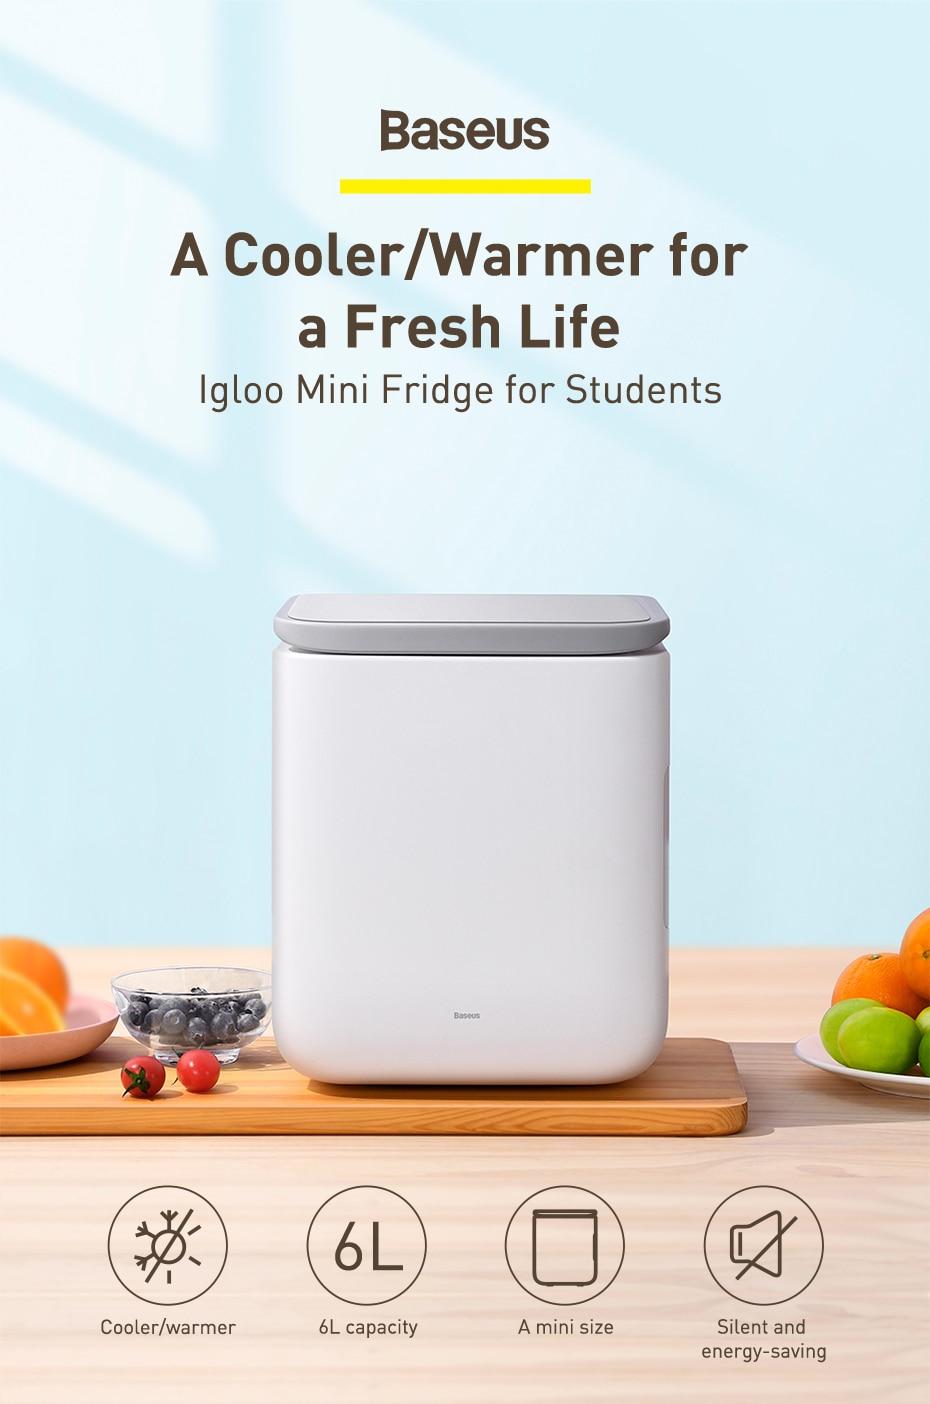 Baseus Igloo Mini Fridge for Students 6L 7